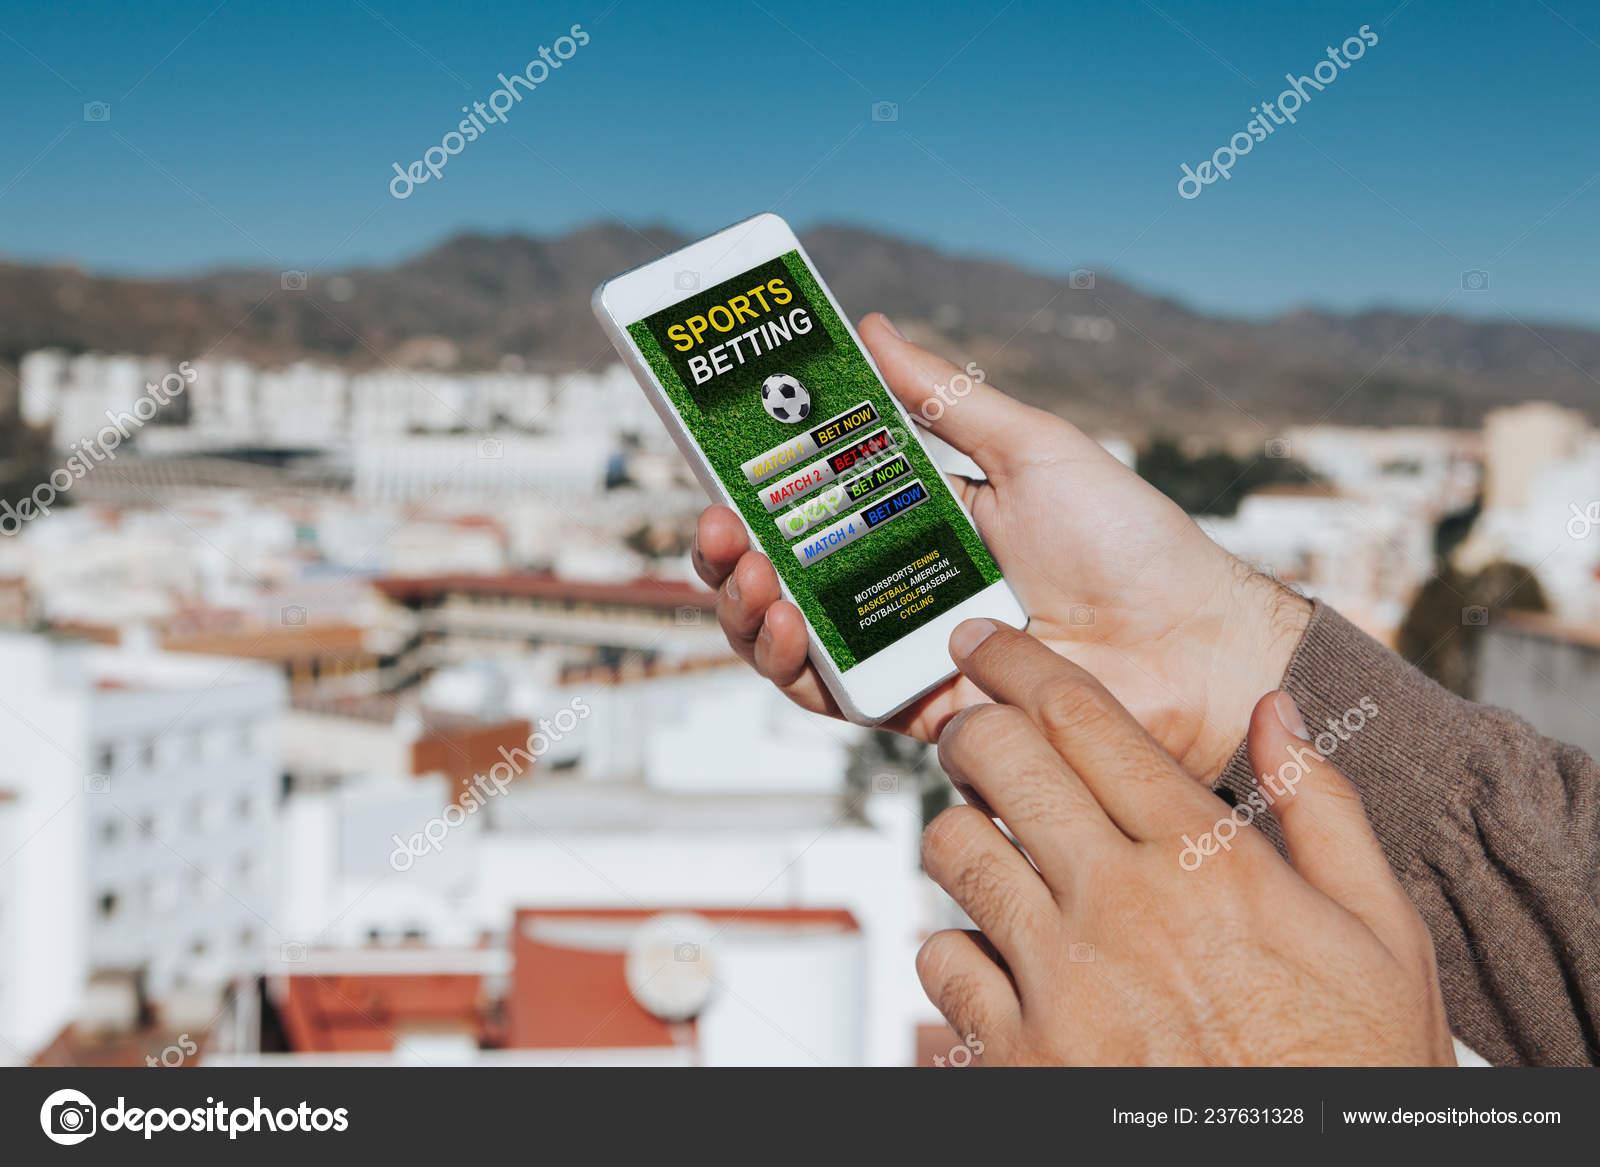 Sports Betting App Mobile Phone Screen — Stock Photo